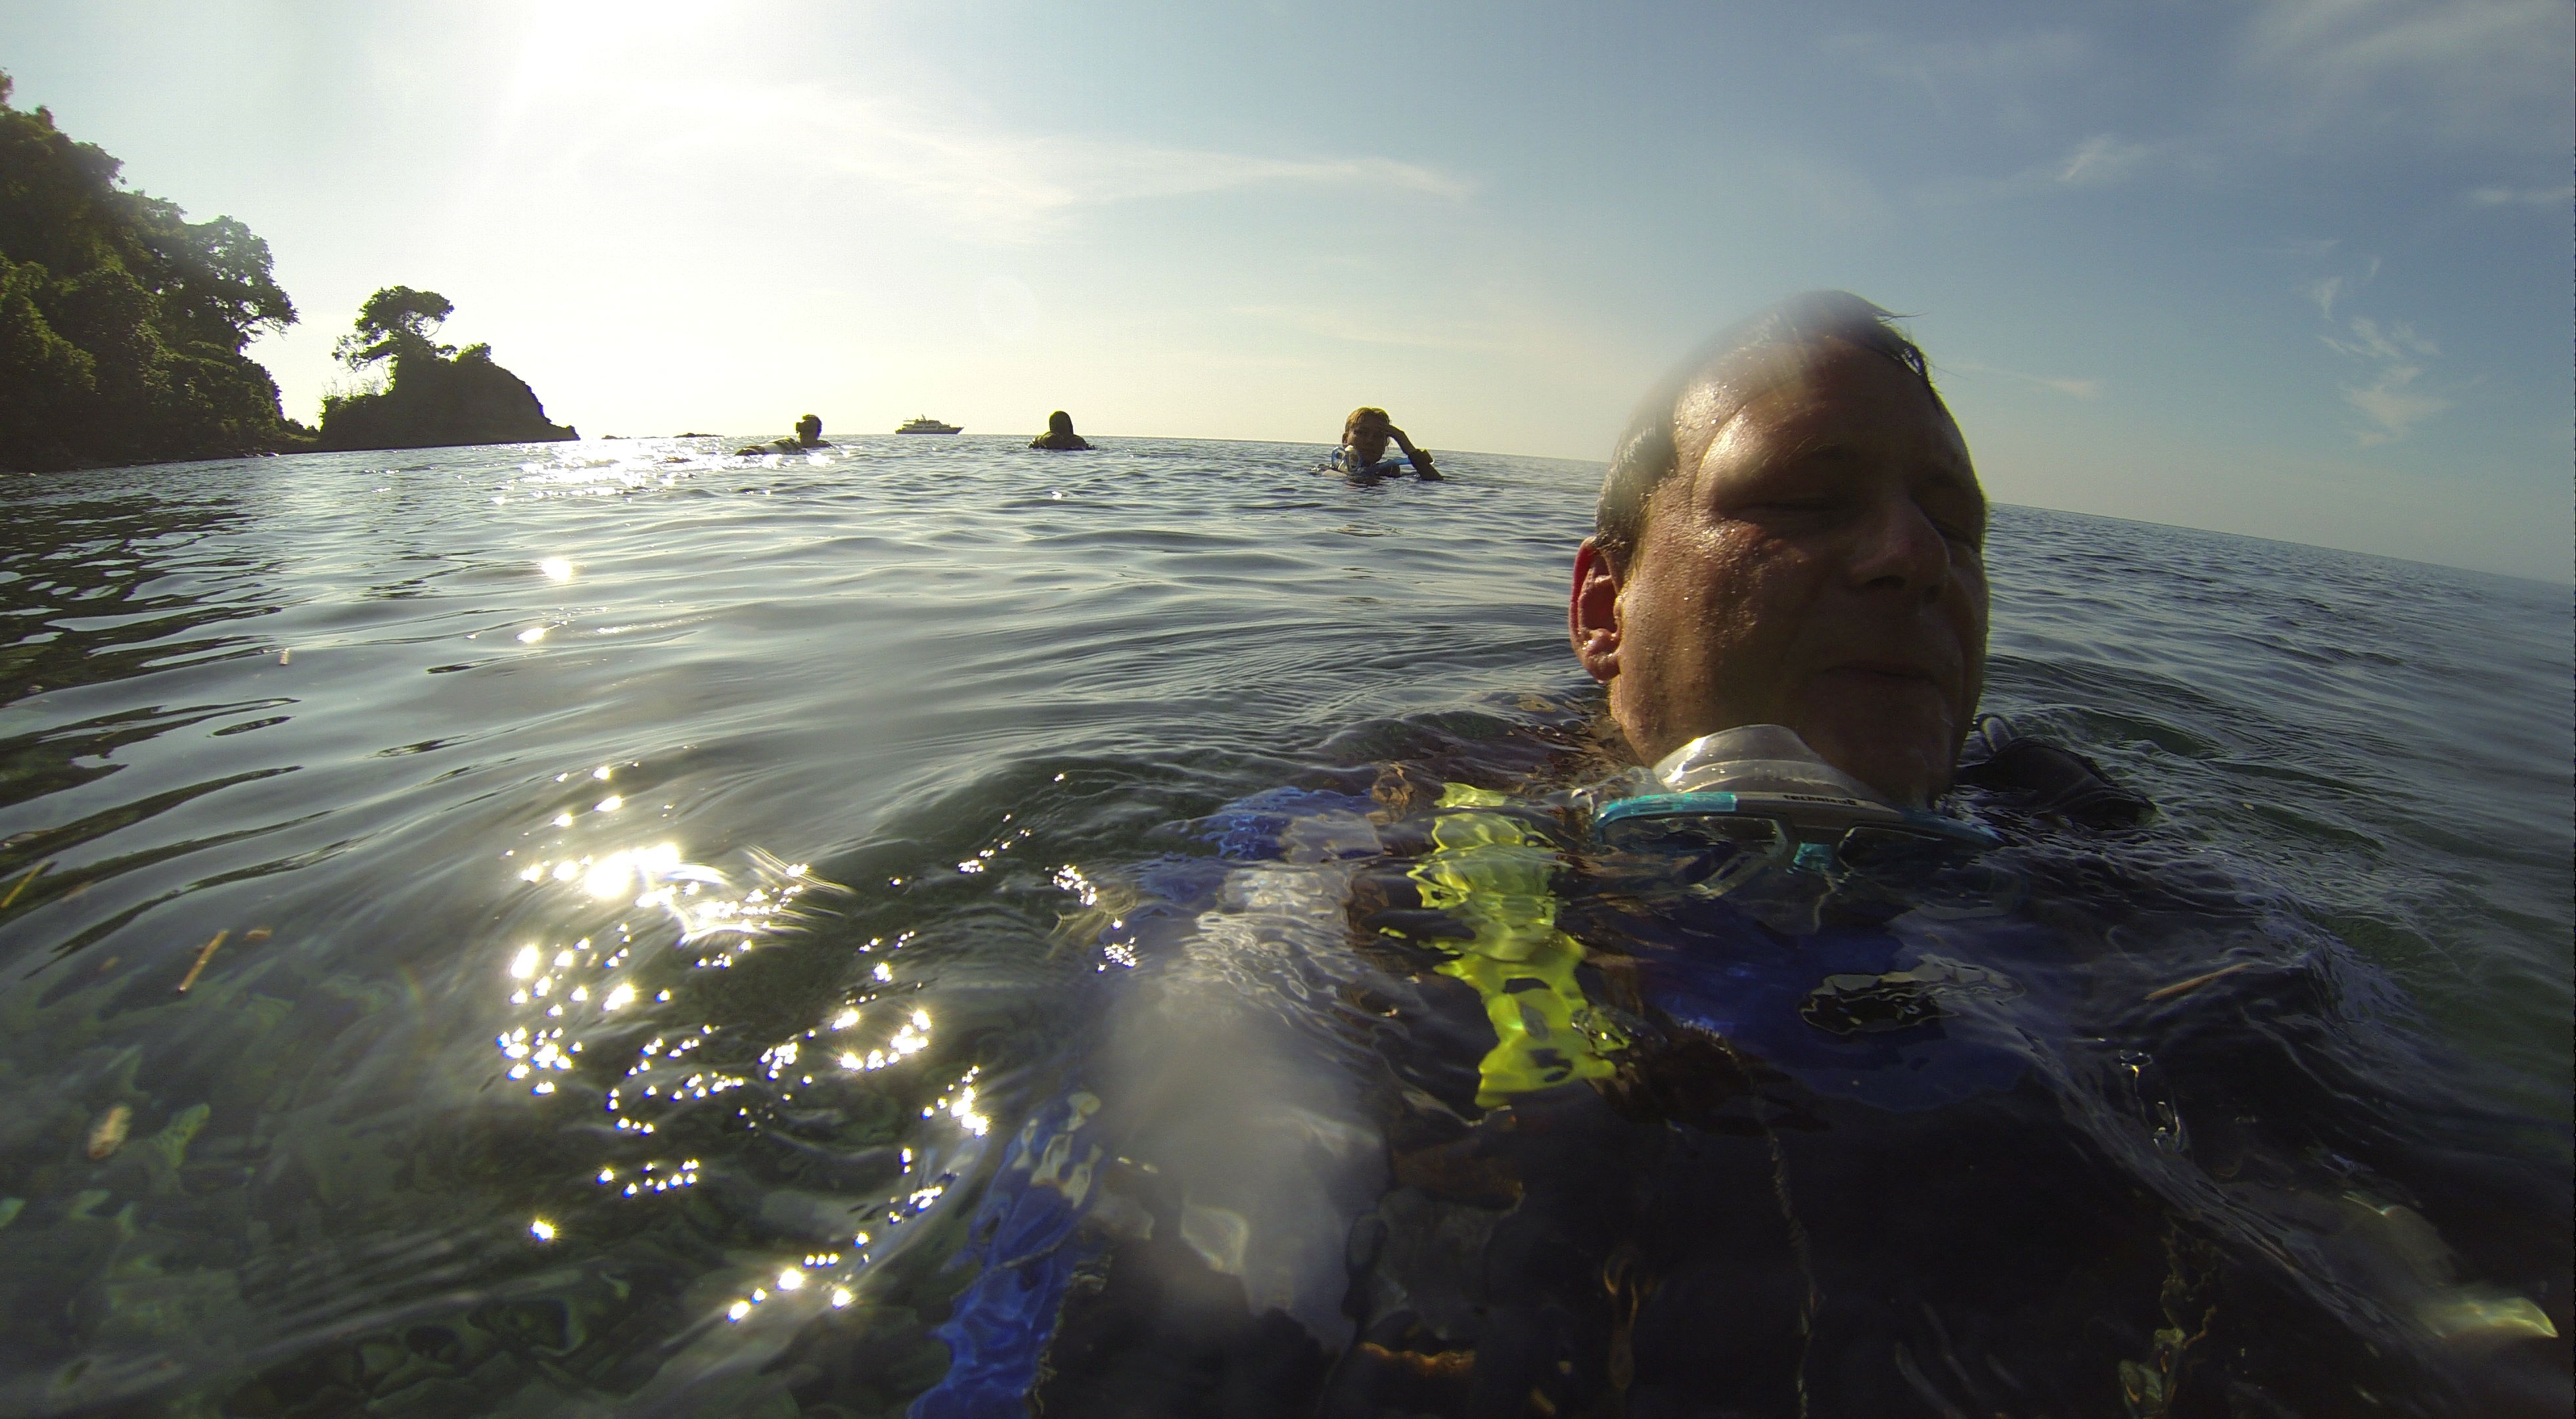 Chris, Nadia, Tilo & Cardice + Mermaid II, Lighthouse Reef/Sangeang (Foto aus GoPro-Video)